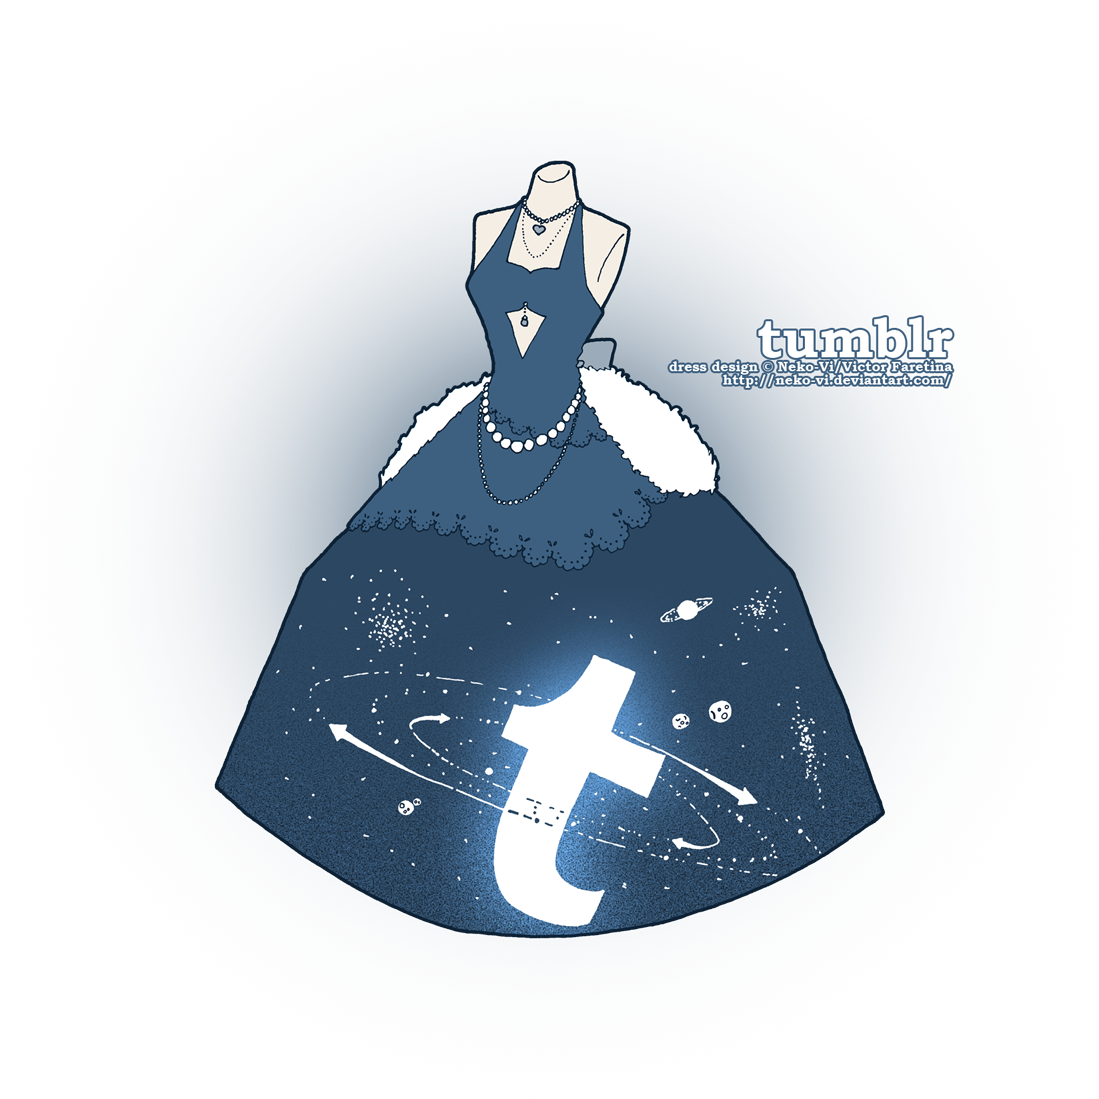 Tumblr in Fashion by Neko-Vi